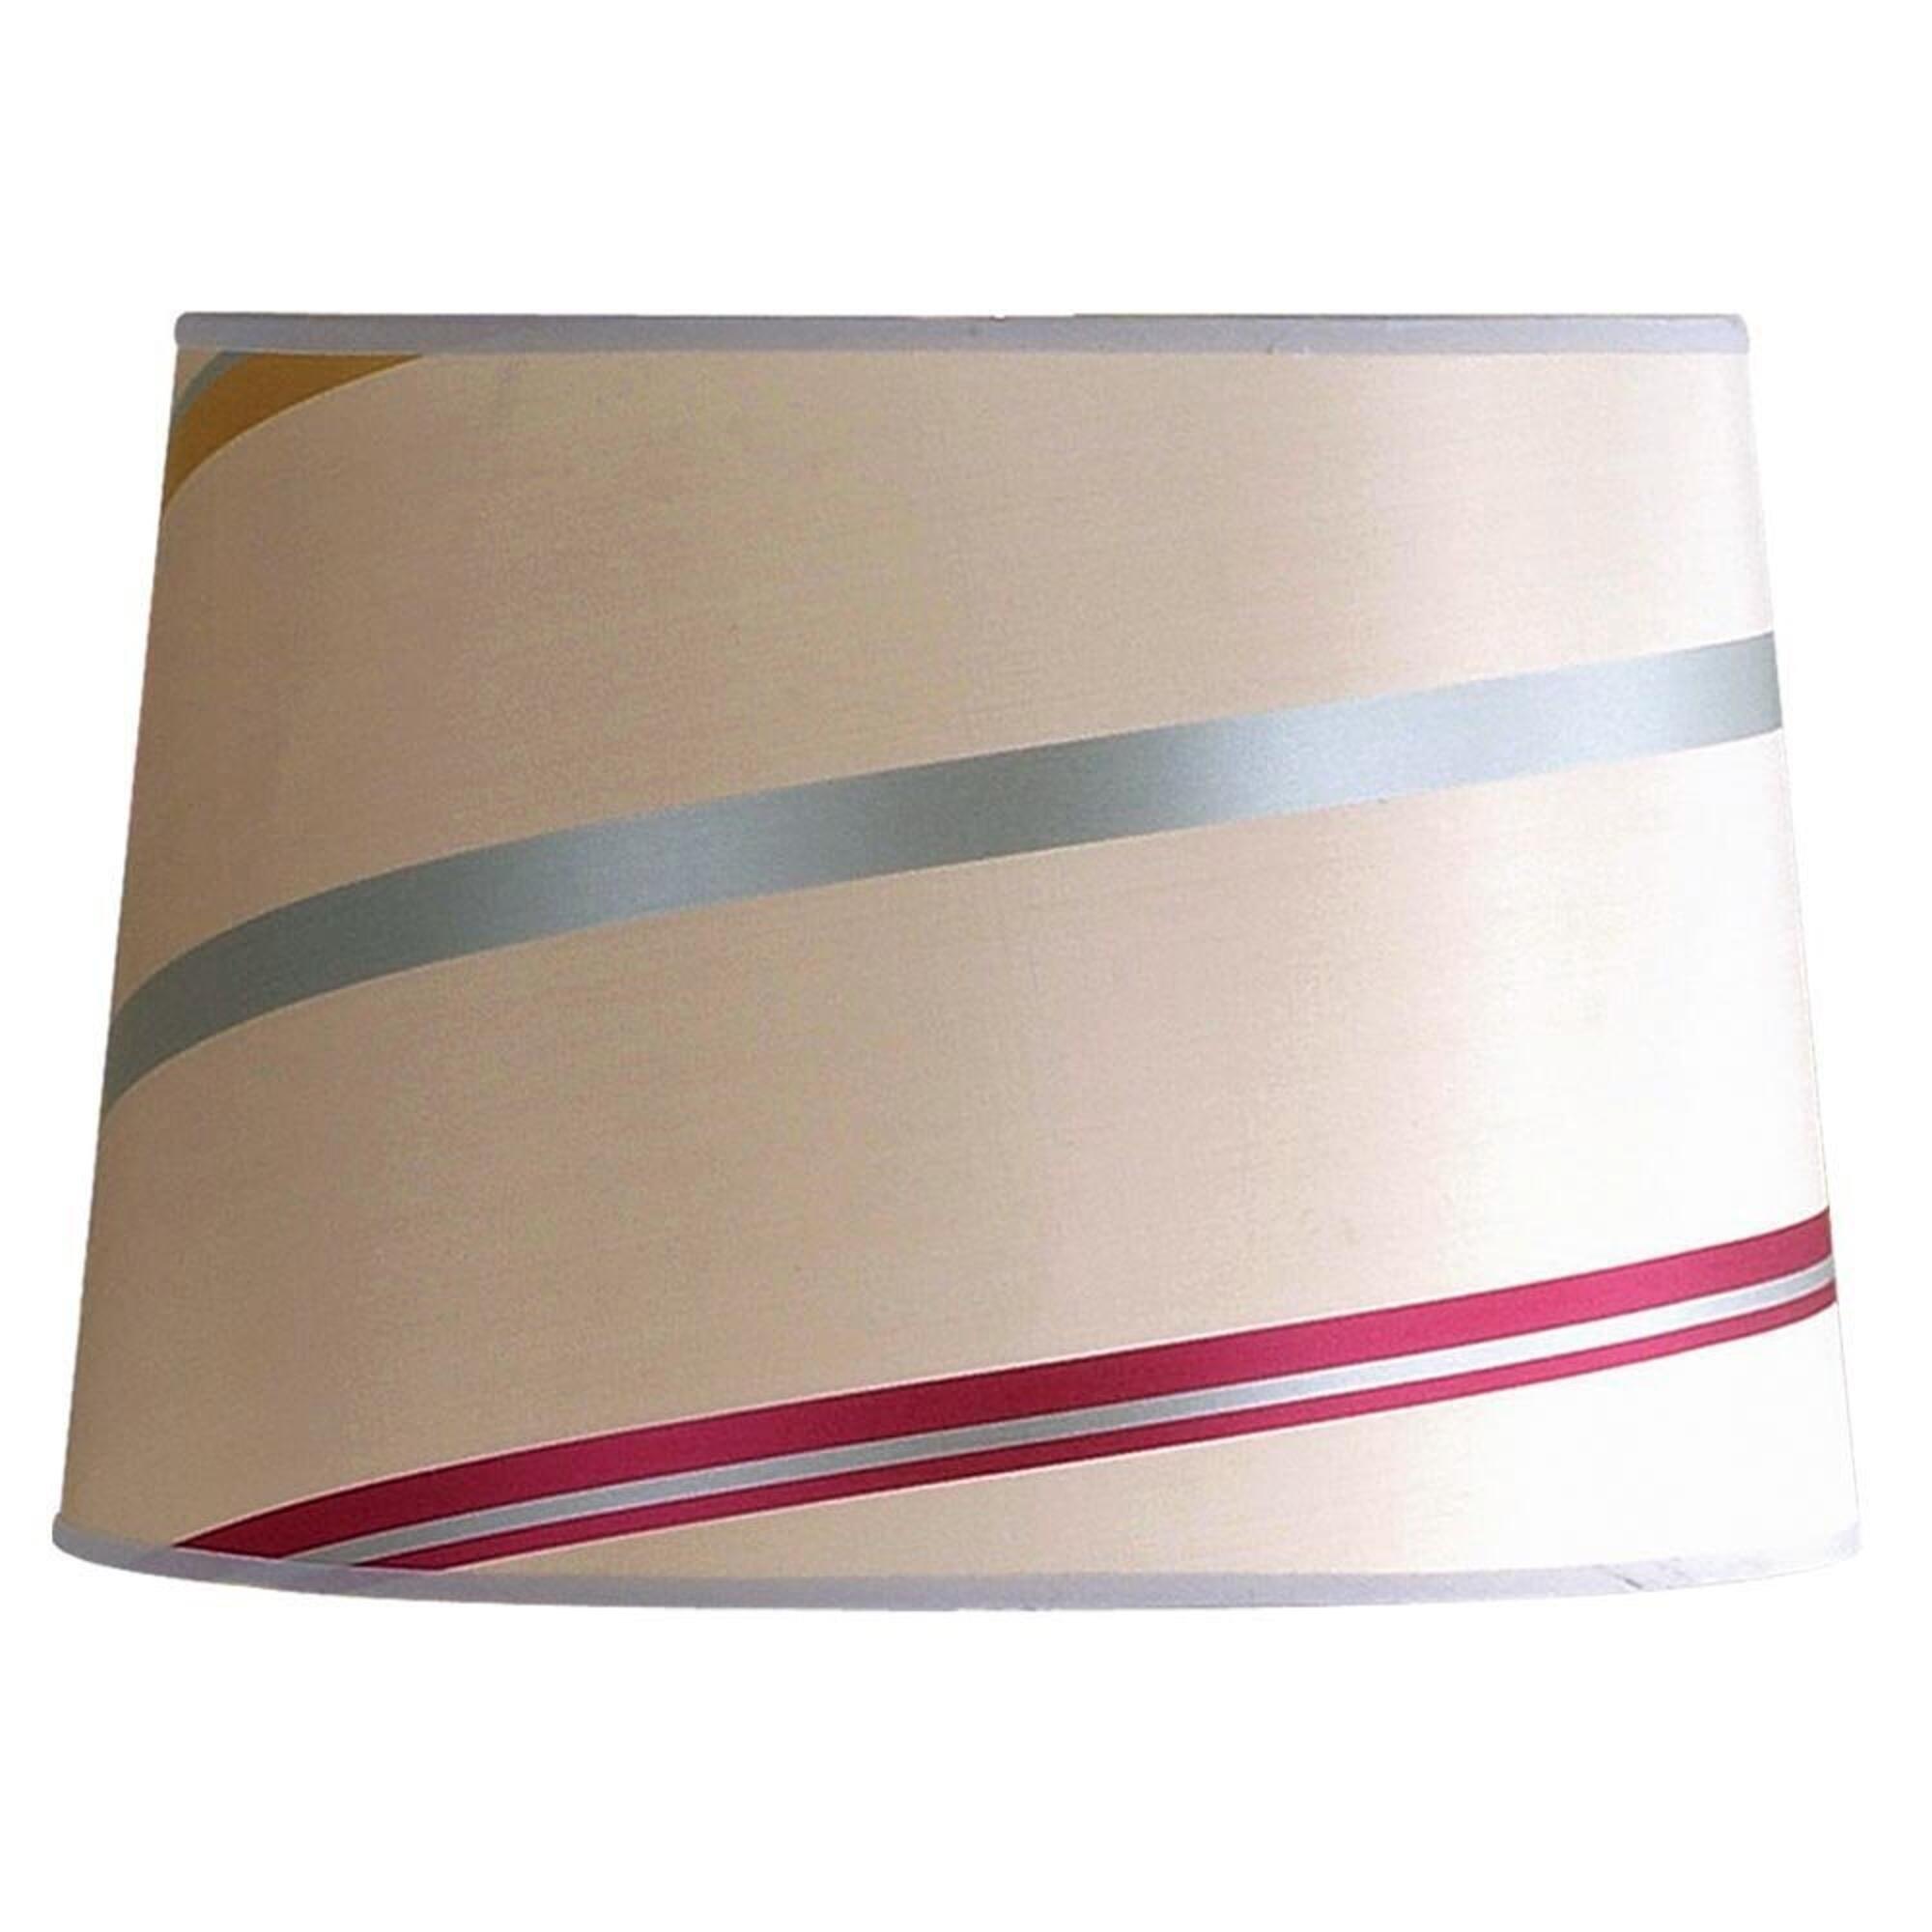 Laura Ashley SLB24114 Juliette 14-Inch Striped Drum Shade